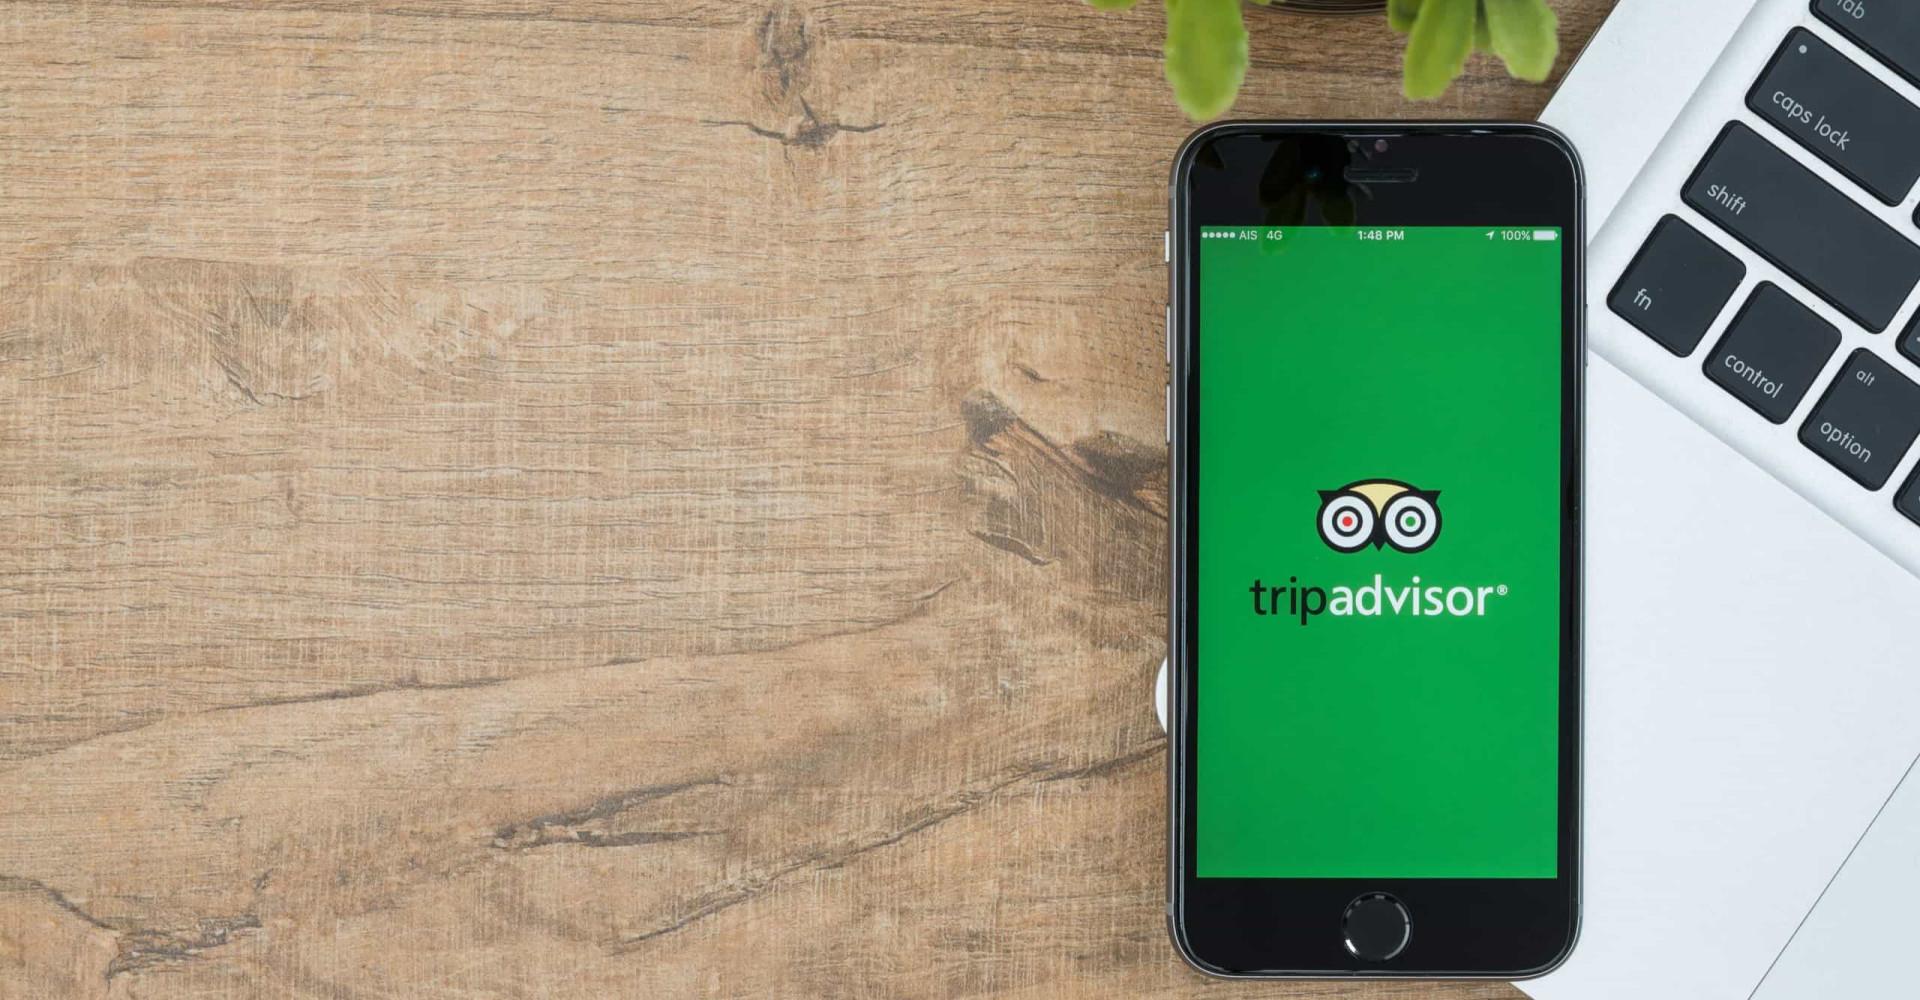 The most absurd TripAdvisor reviews